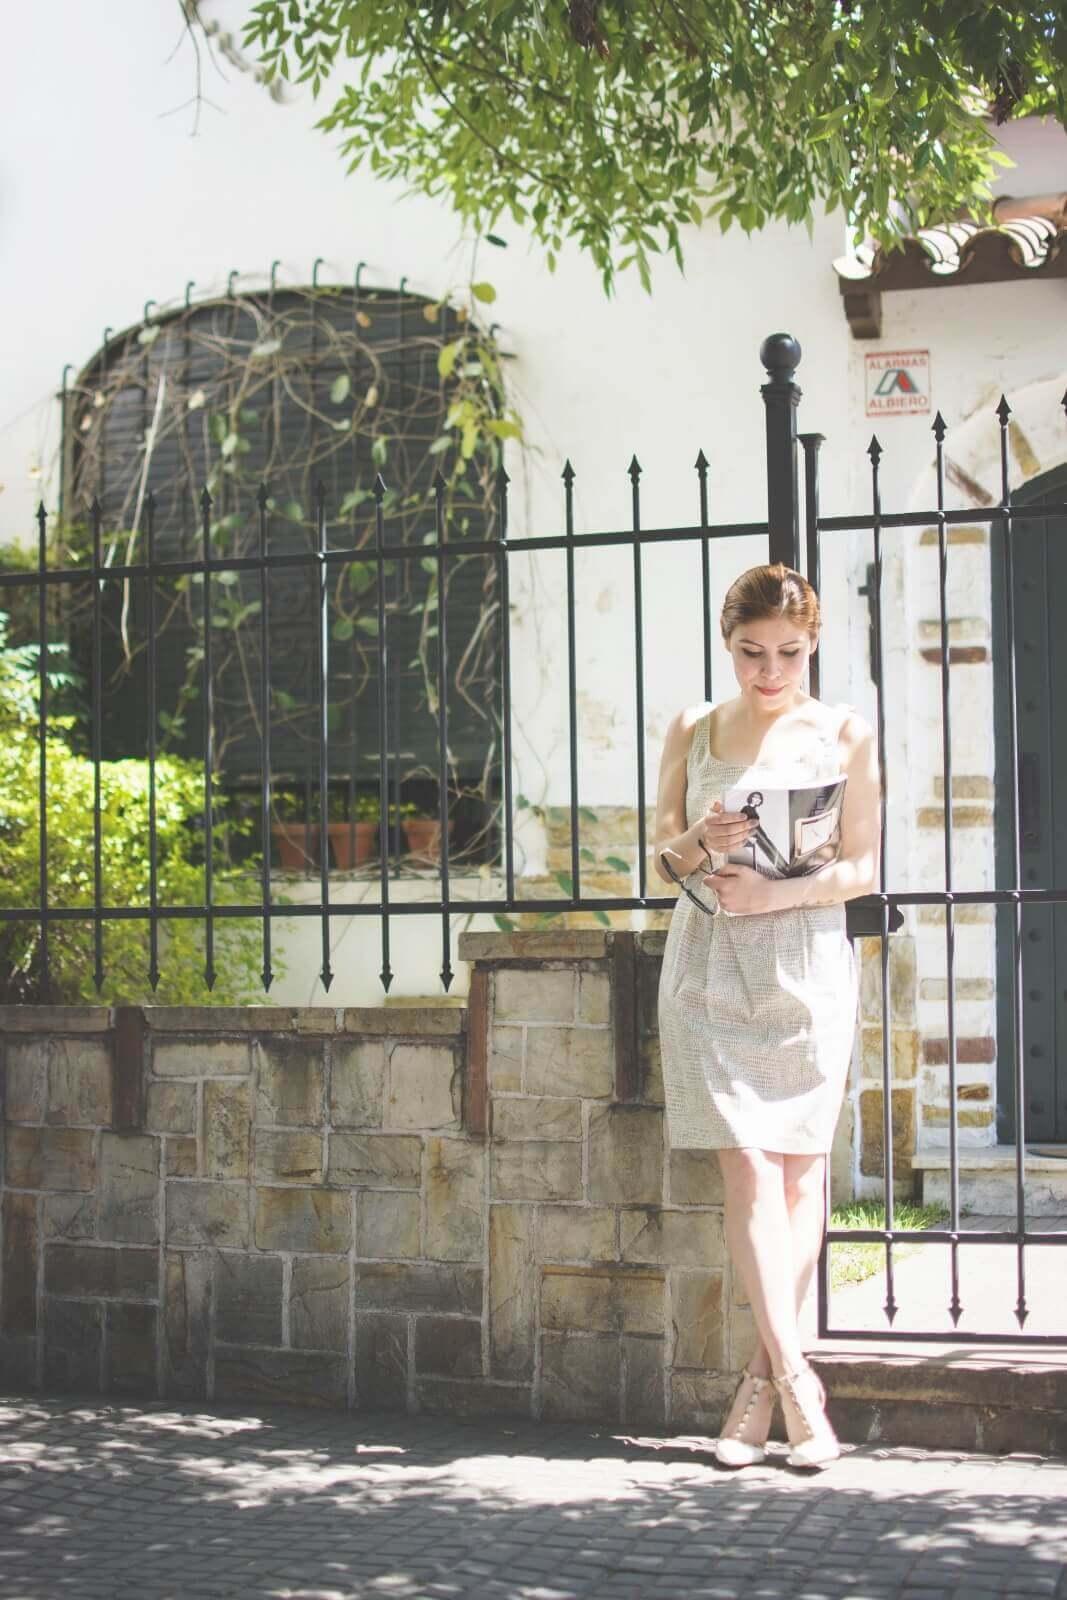 almond-white-dress-sammydress-stilettos-valentino-rockstud-imitation-deborah-ferrero-style-by-deb-ladylike03